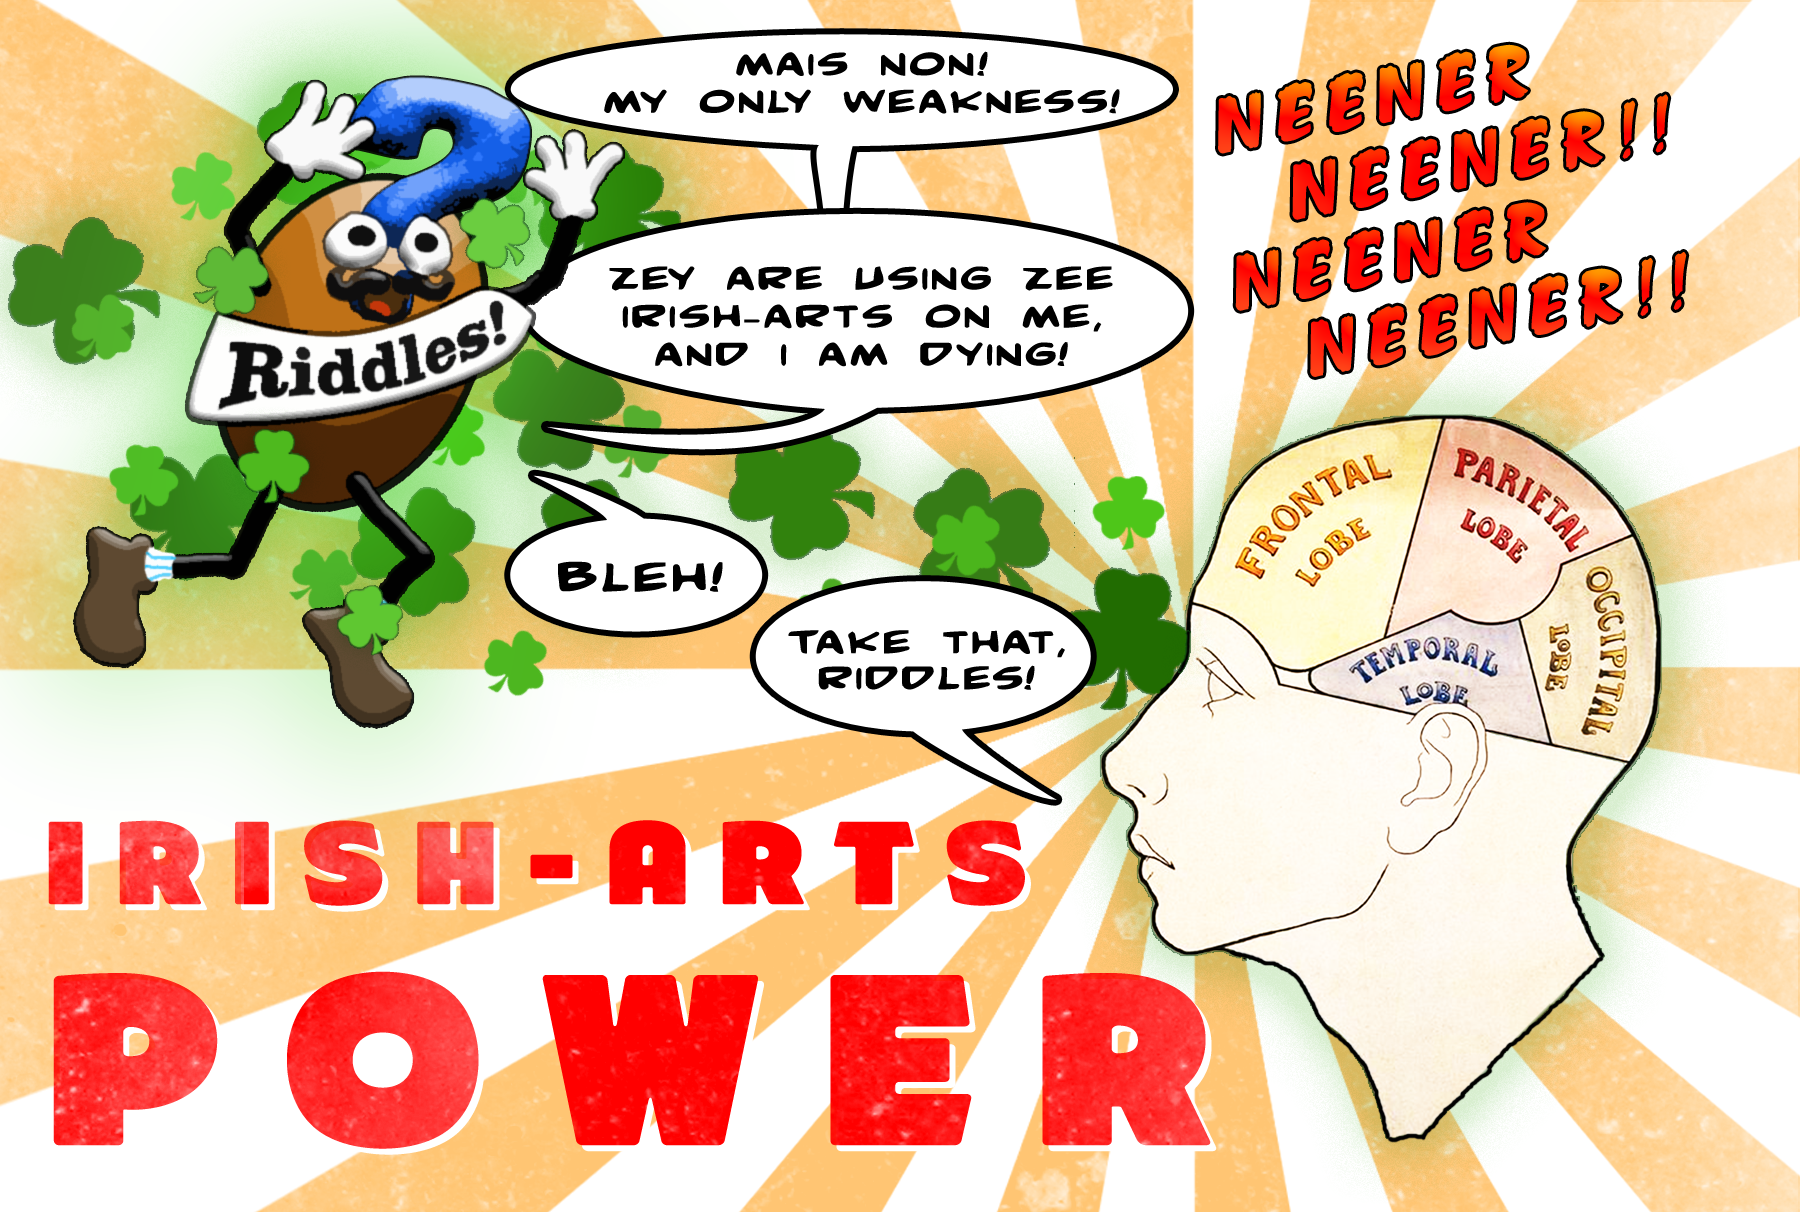 Irish-Arts Power.png